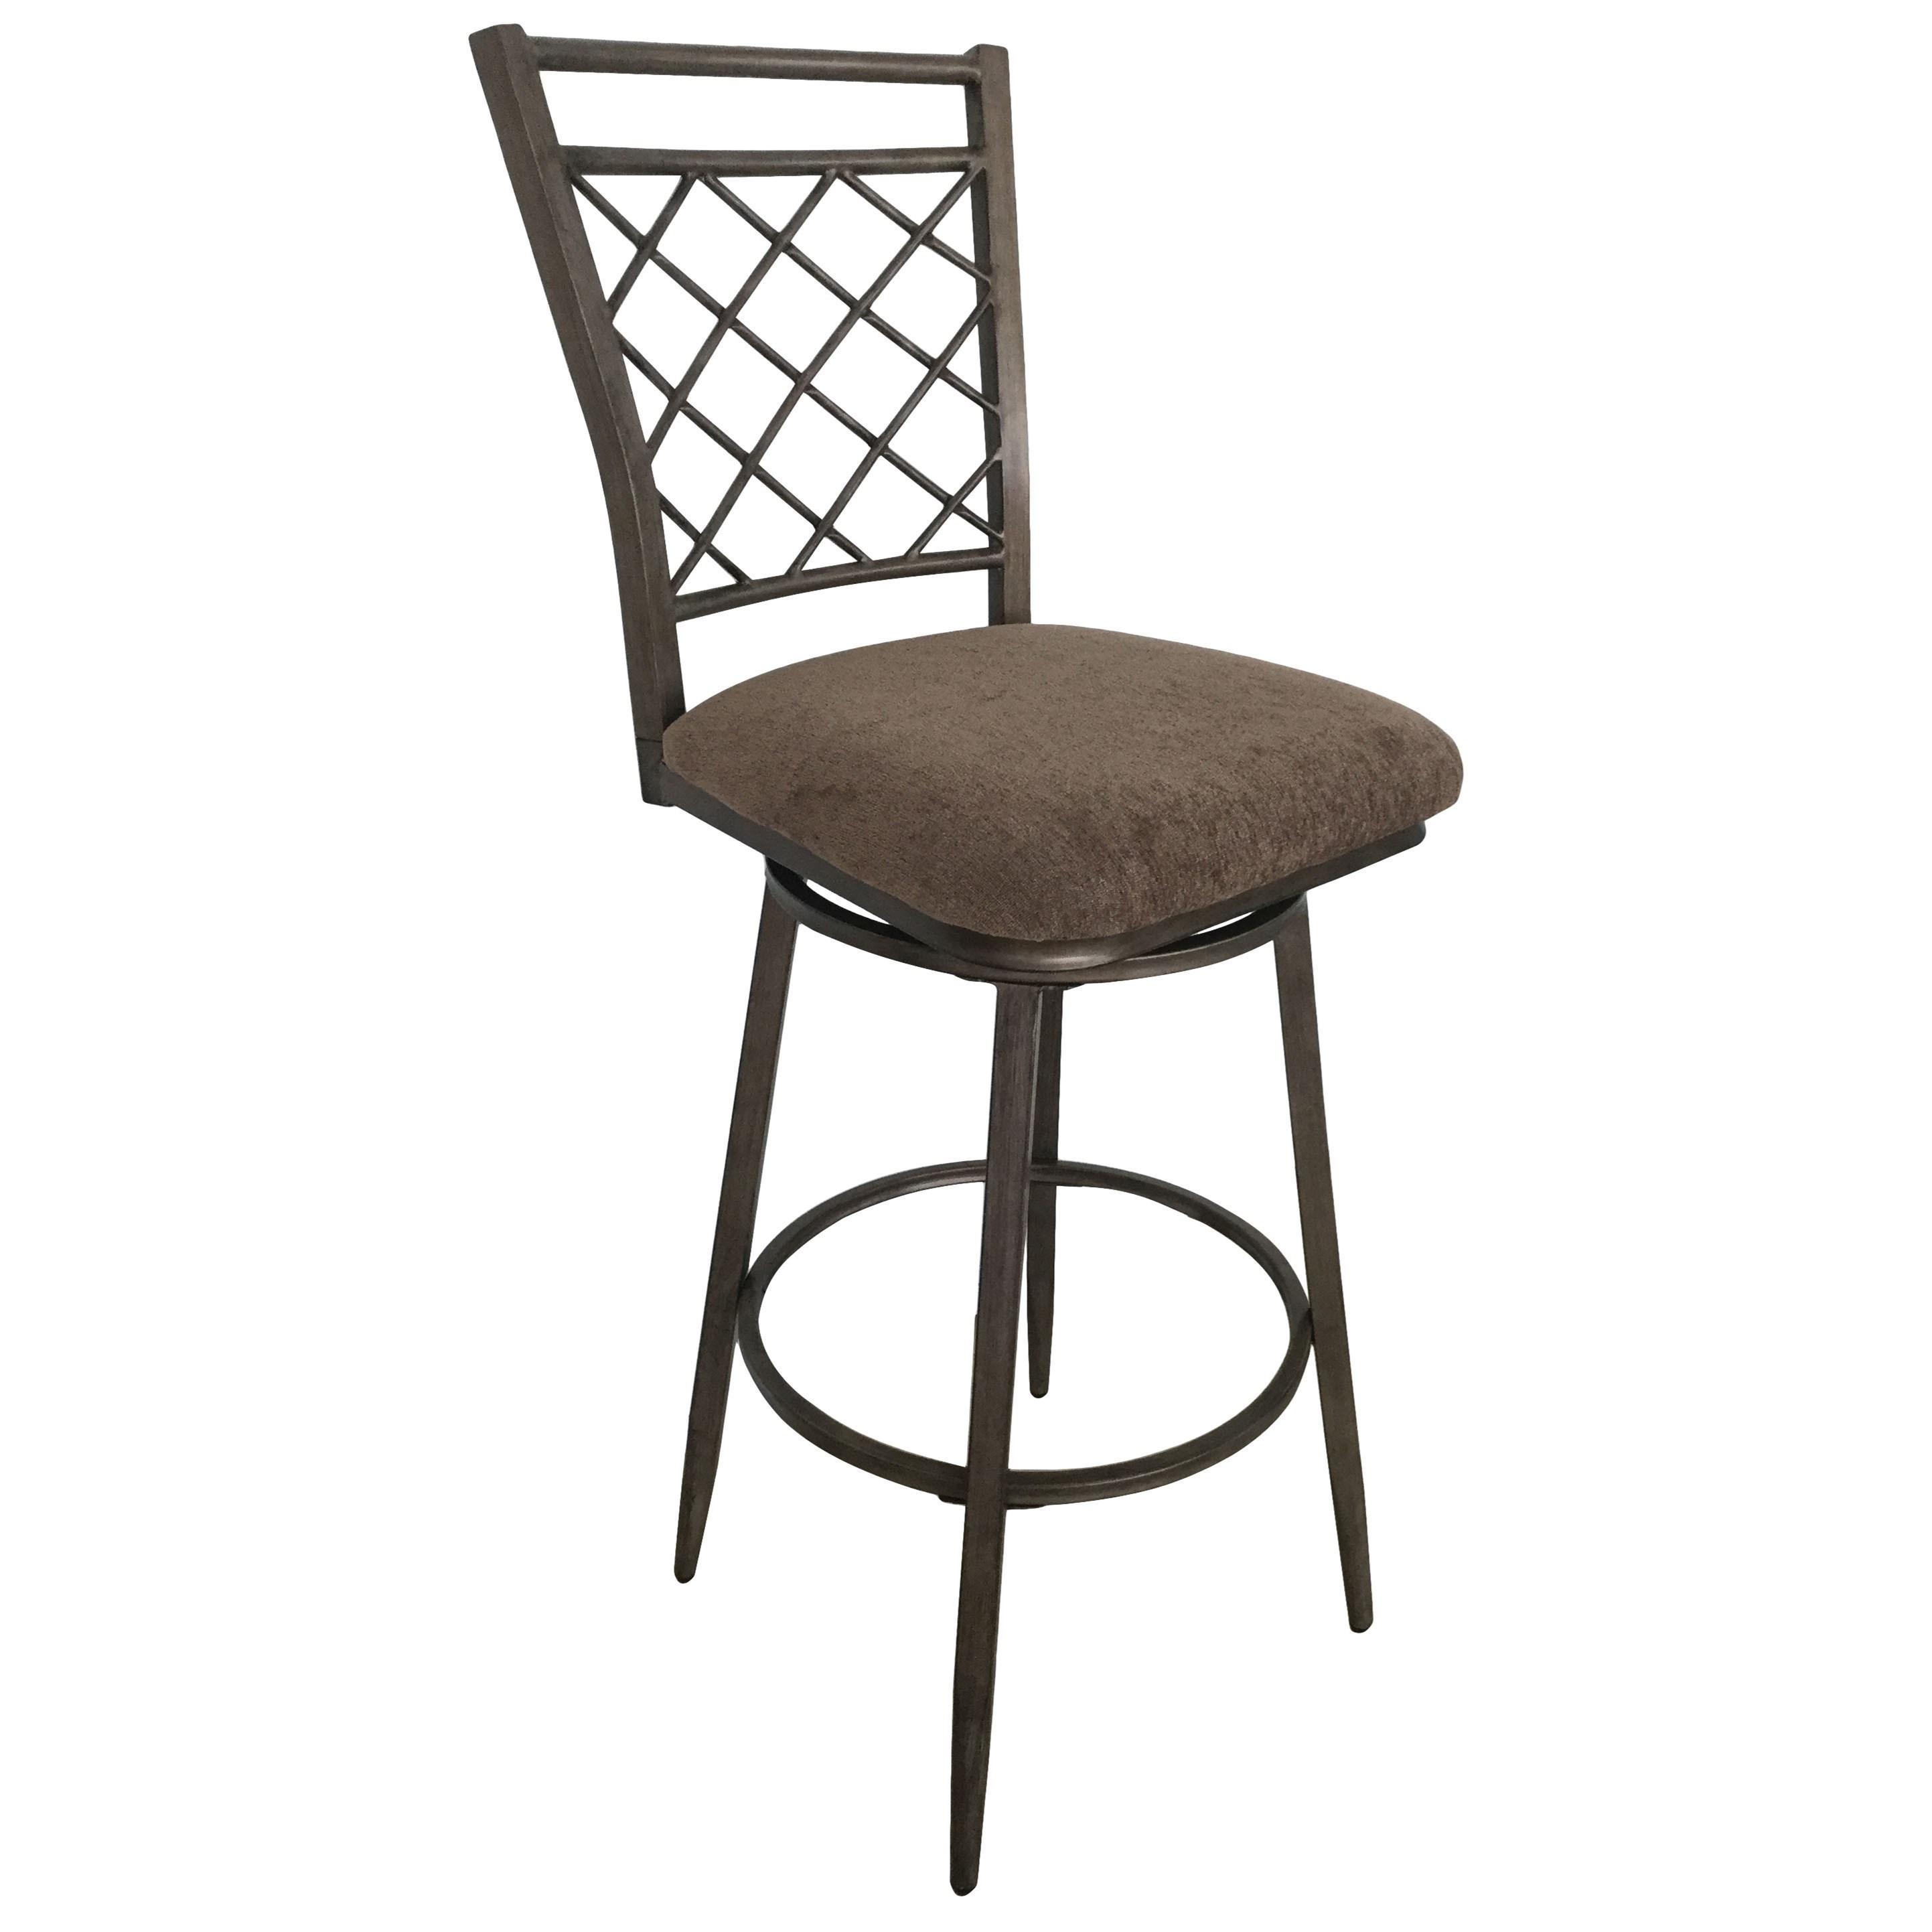 Aldric Set of 2 Bar Stools by Acme Furniture at Carolina Direct